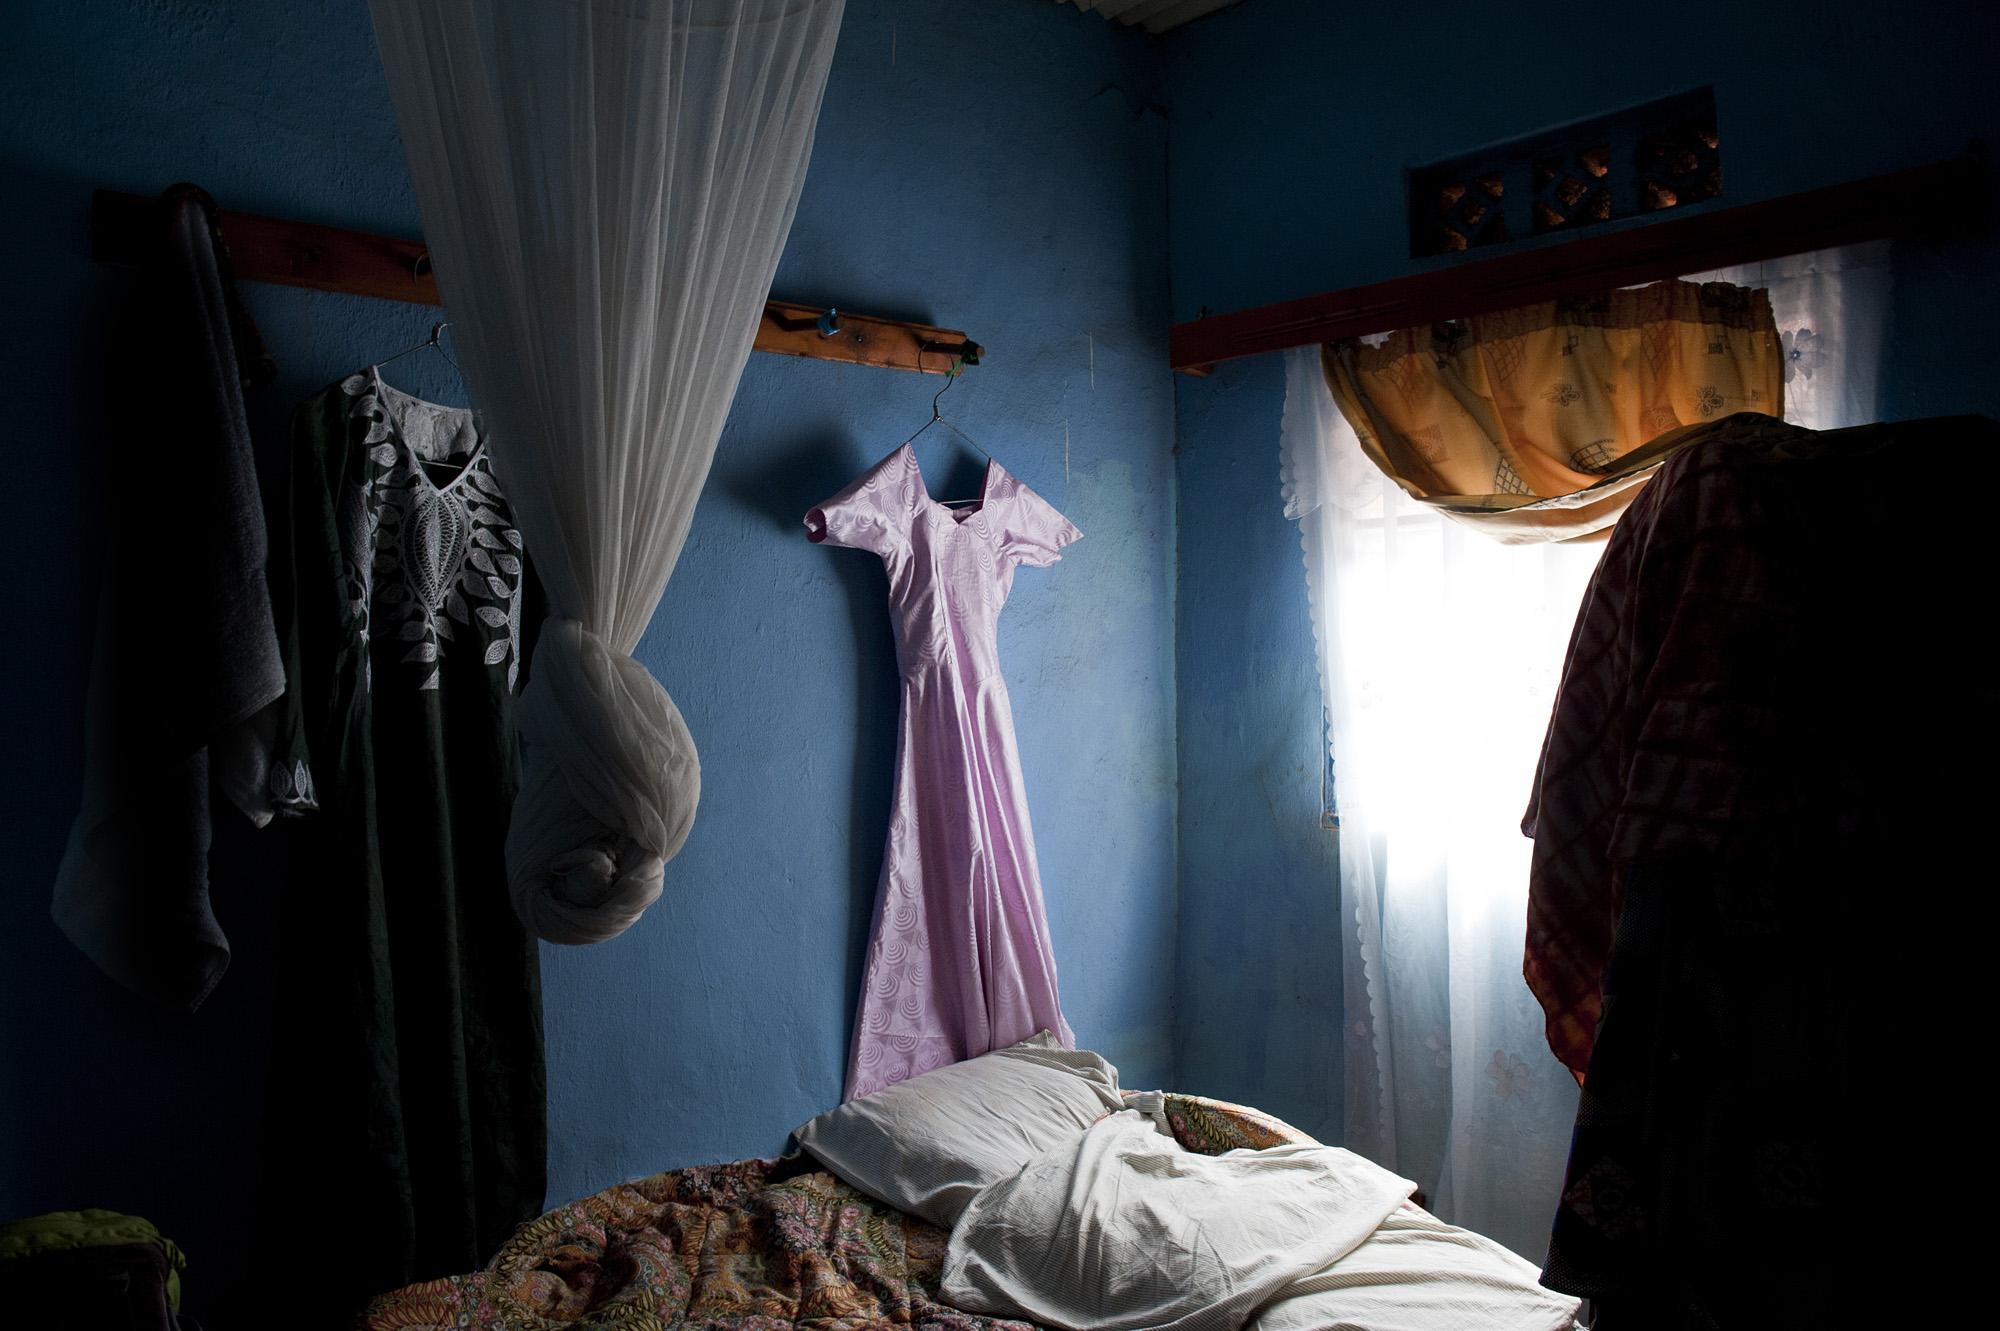 Godelieve's pink dress